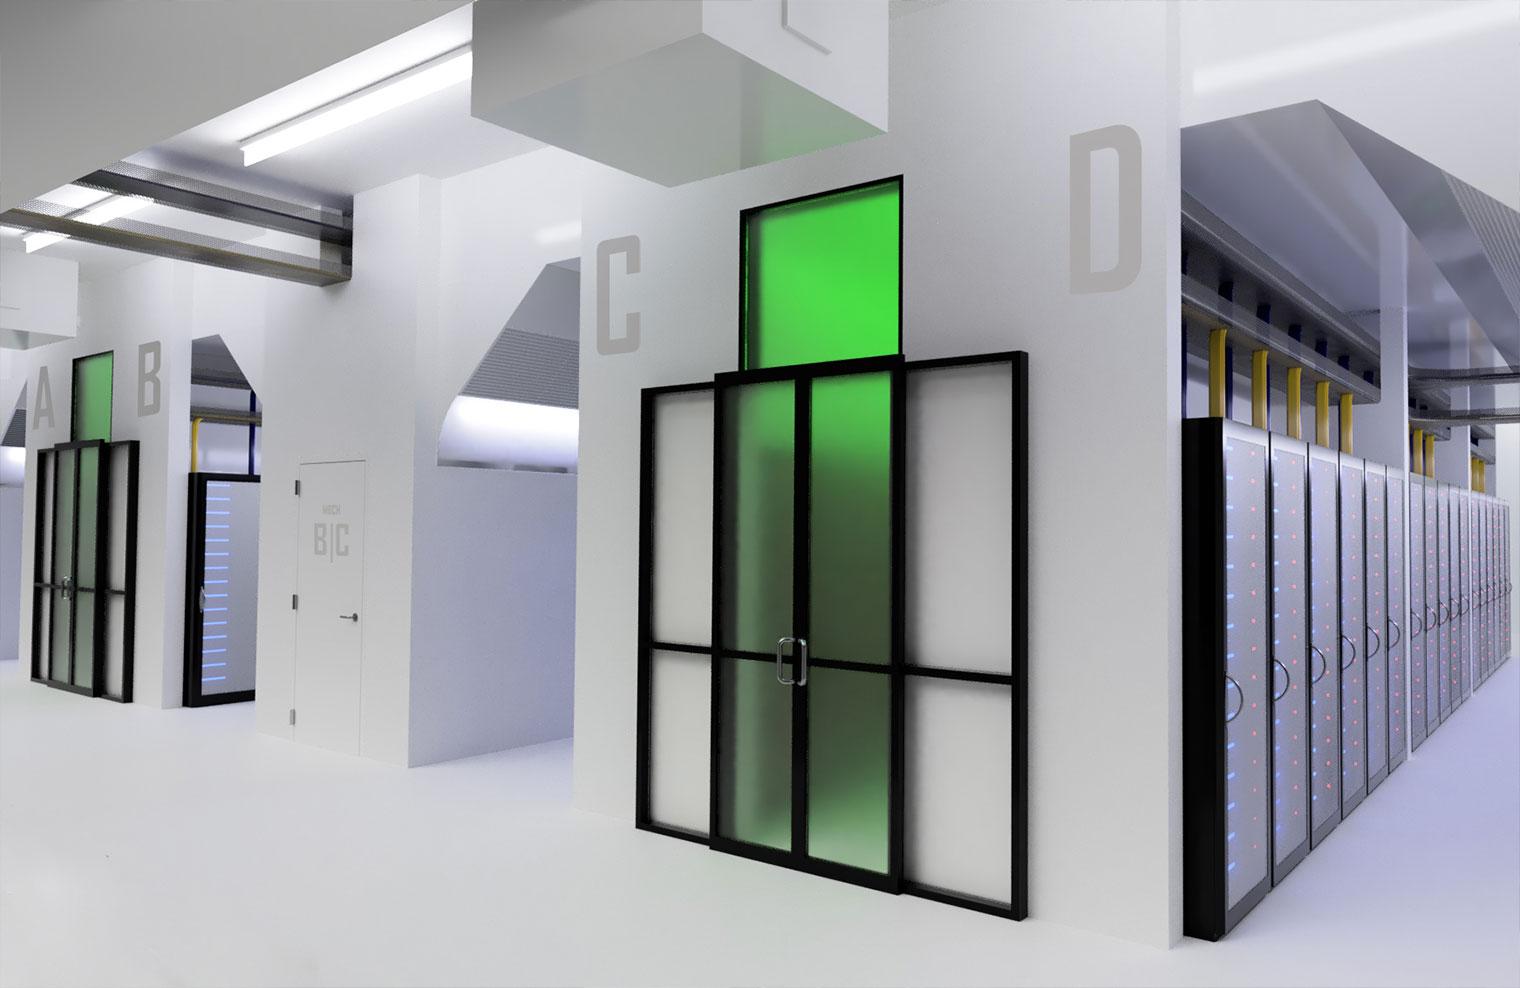 Interior view of Edged modular data center pods